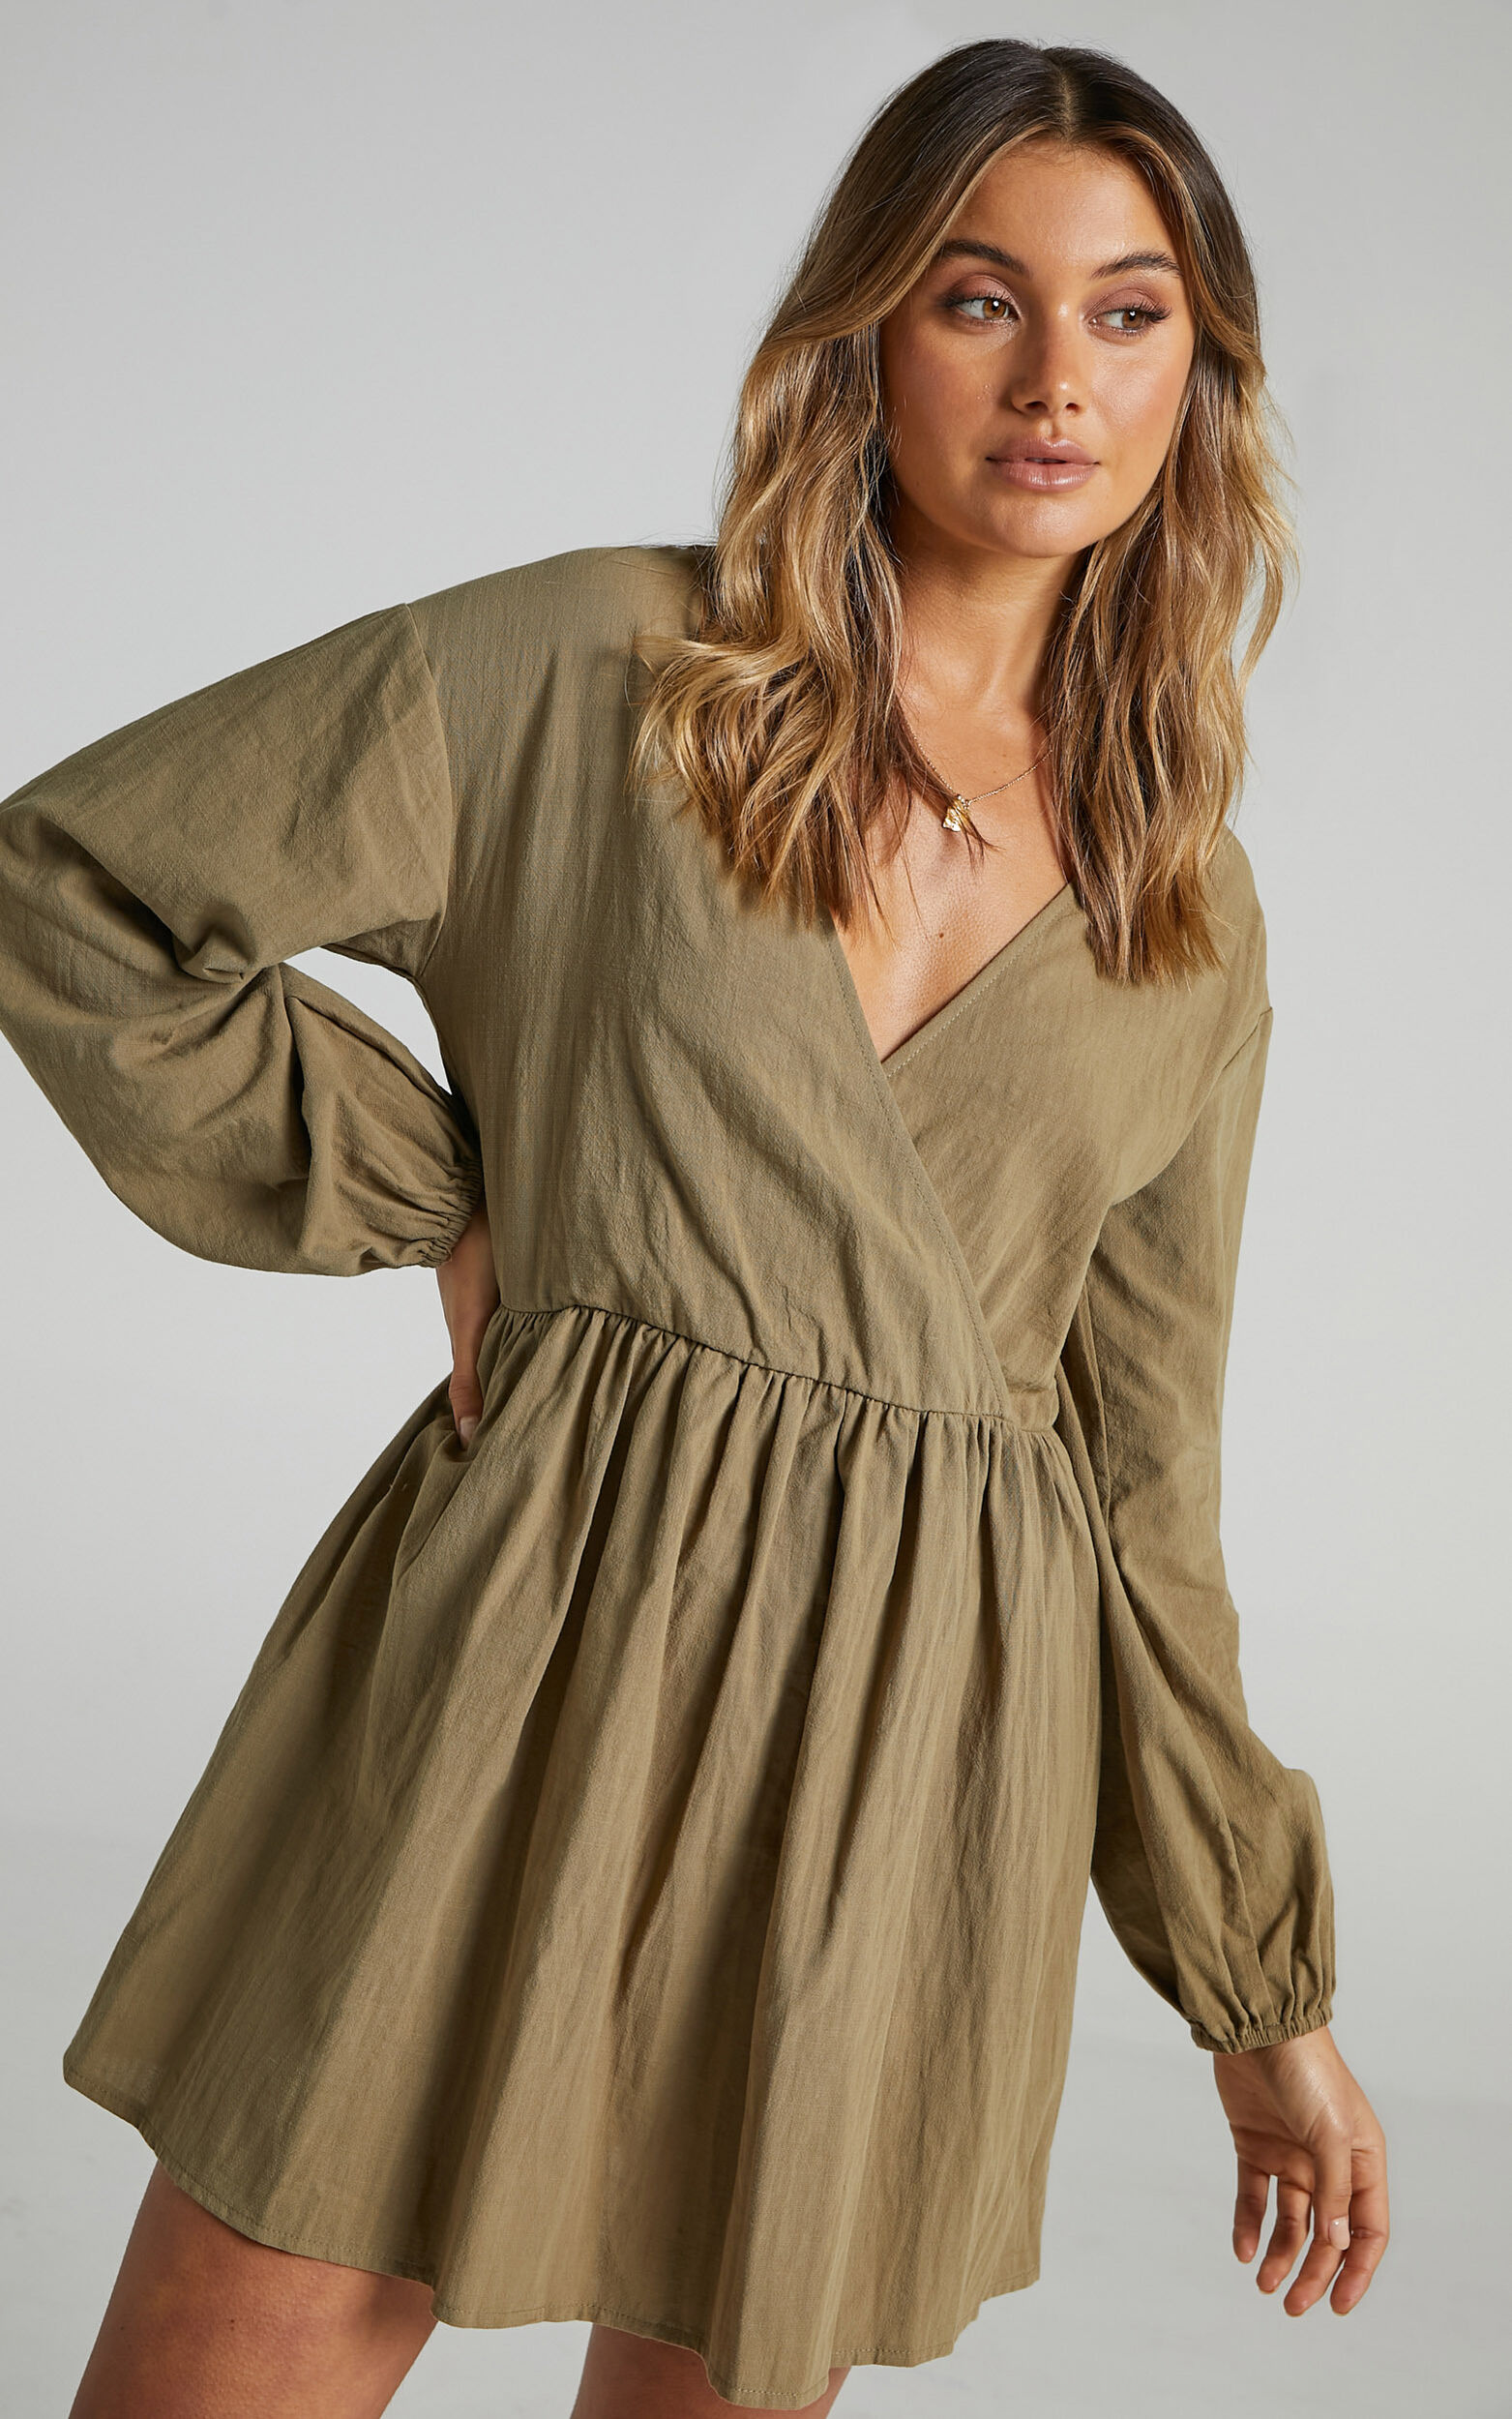 Kensley Wrap Front Long Sleeve Mini Dress in Khaki - 04, GRN1, super-hi-res image number null